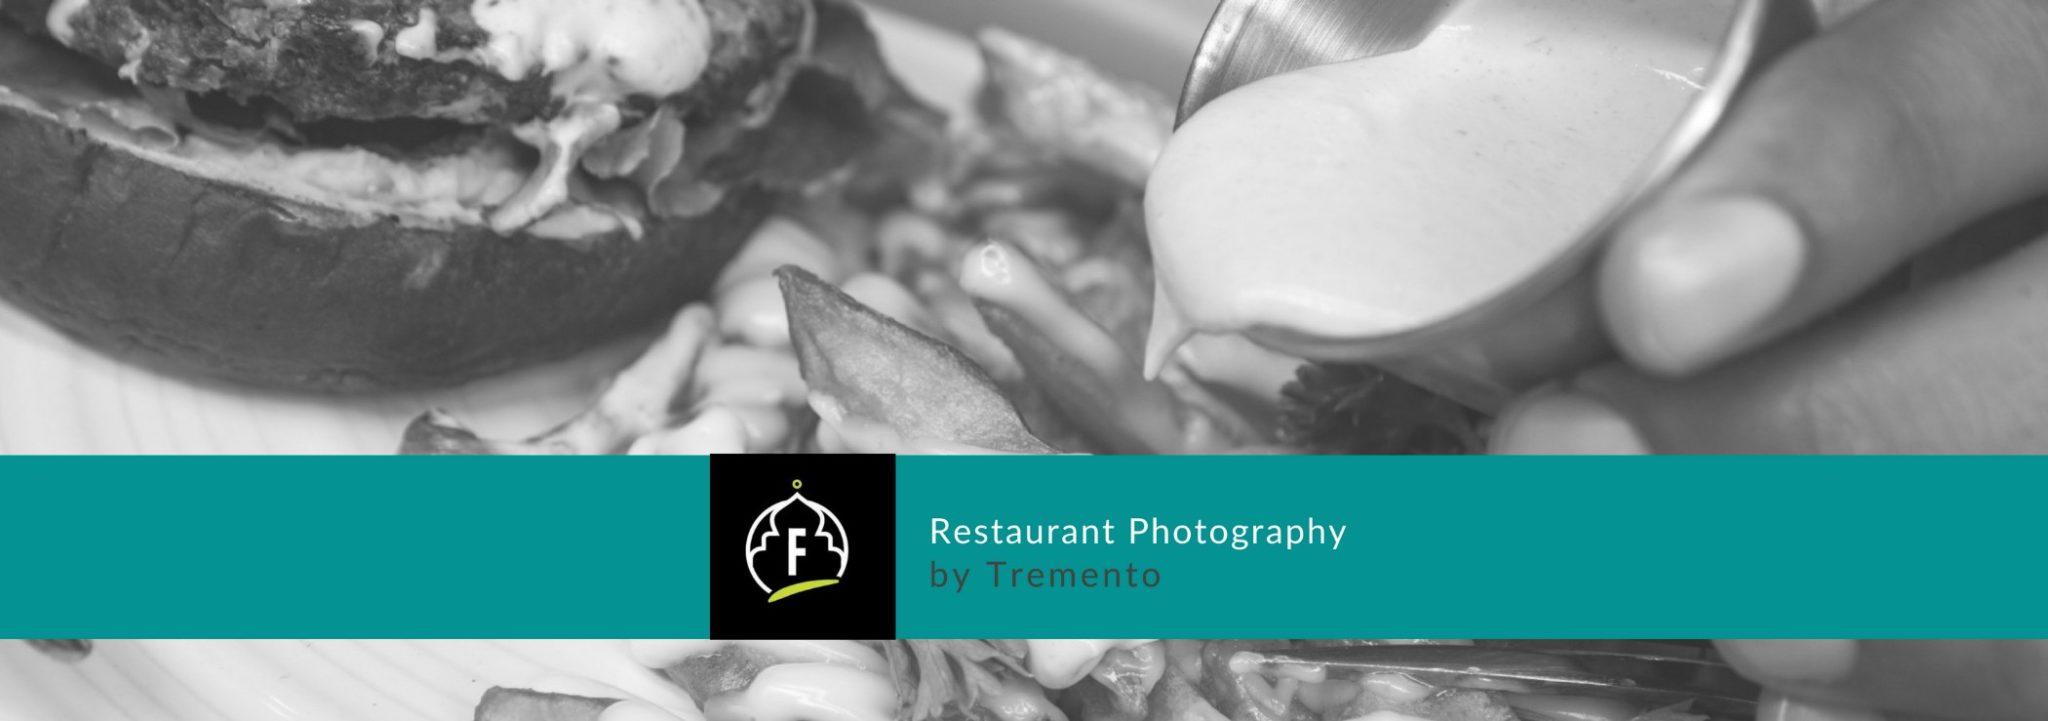 Tremento Portfolio Falafel House Restaurant Photography